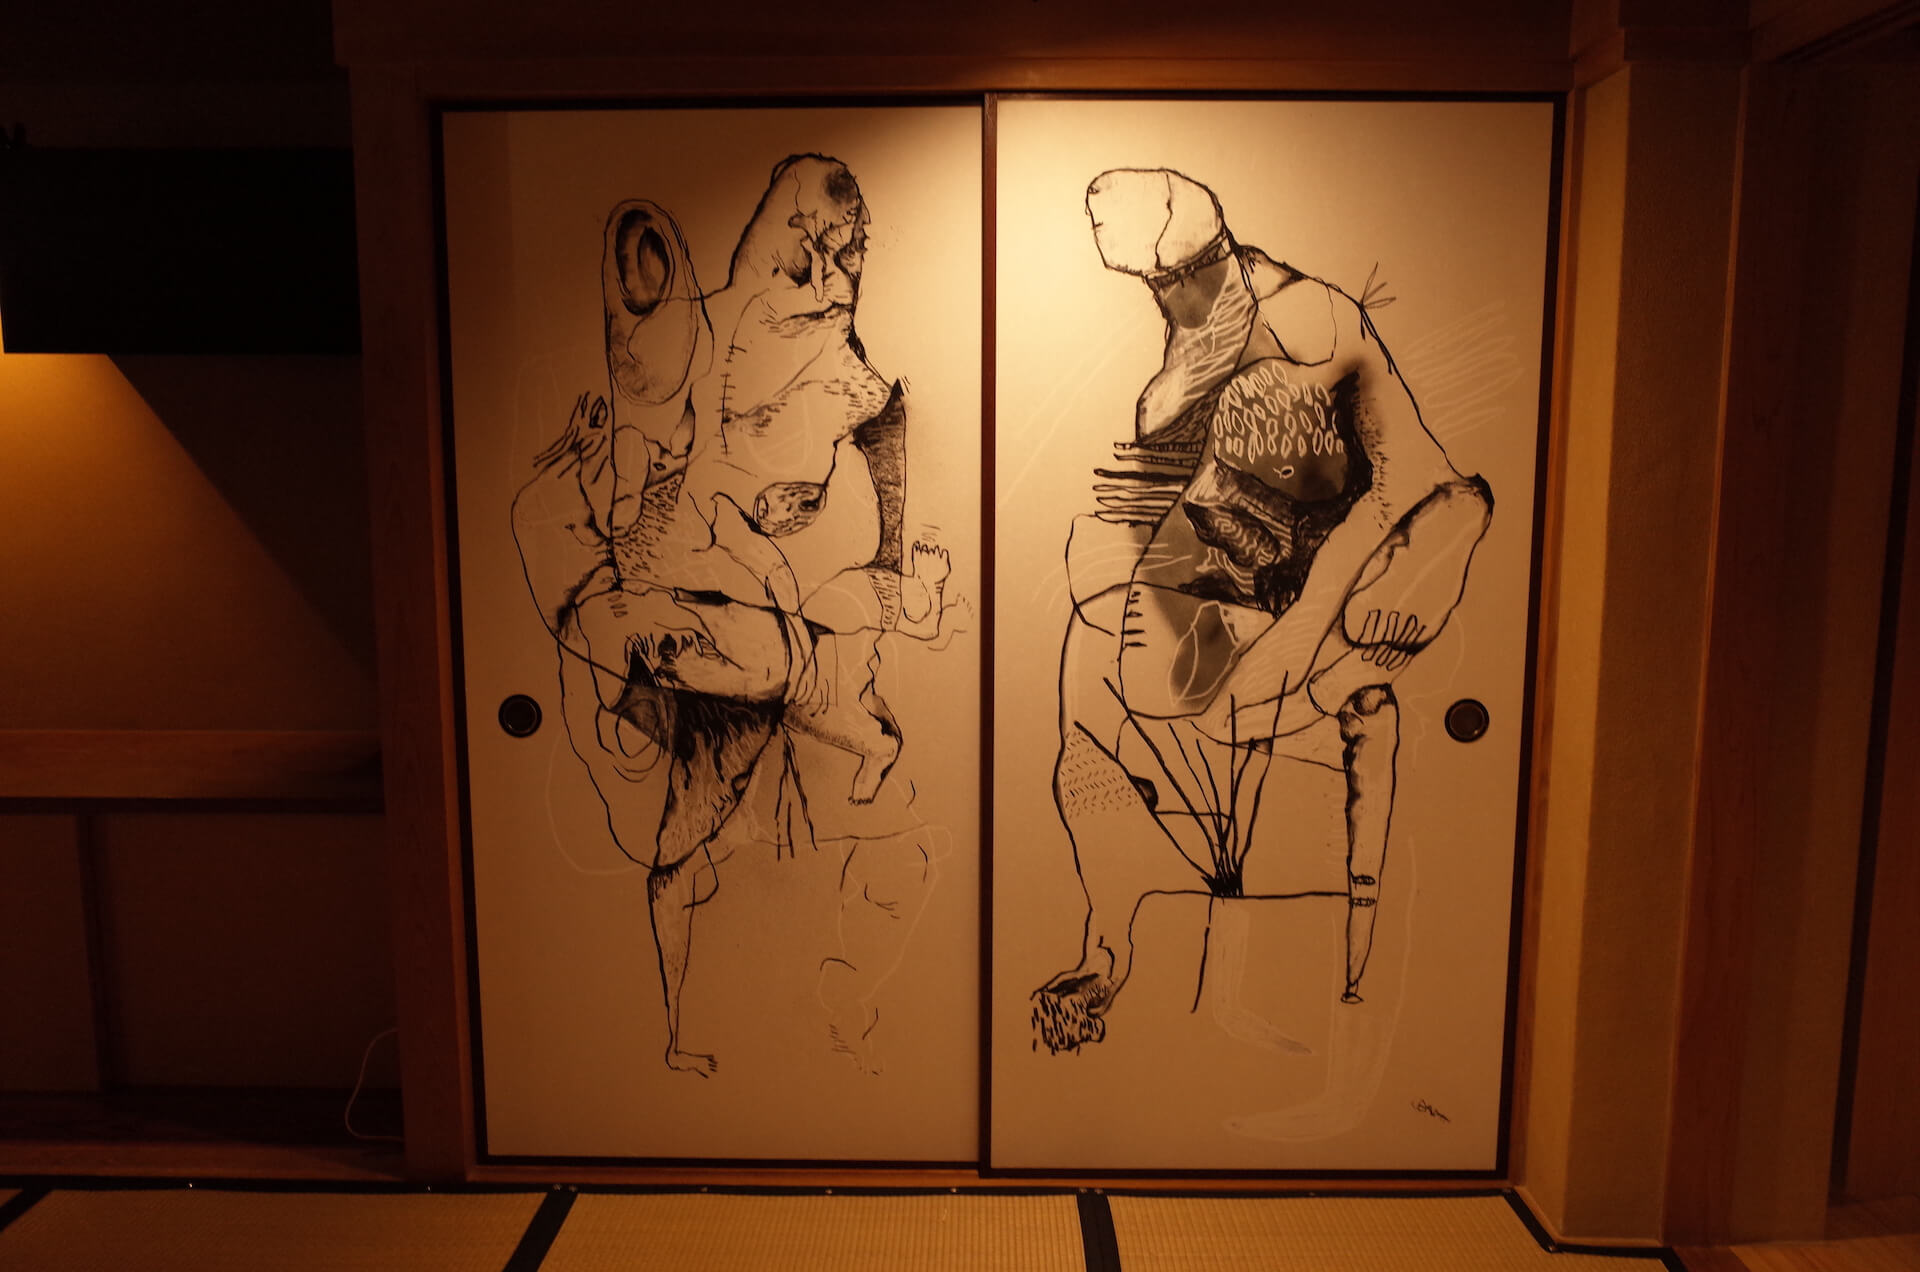 UC EASTの東京初個展「MOTHER」がANAGRAにて開催 オープニングパーティには¥ØU$UK€ ¥UK1MAT$U、Akie、Celterが出演 art-culture201202-uceast-anagra-4